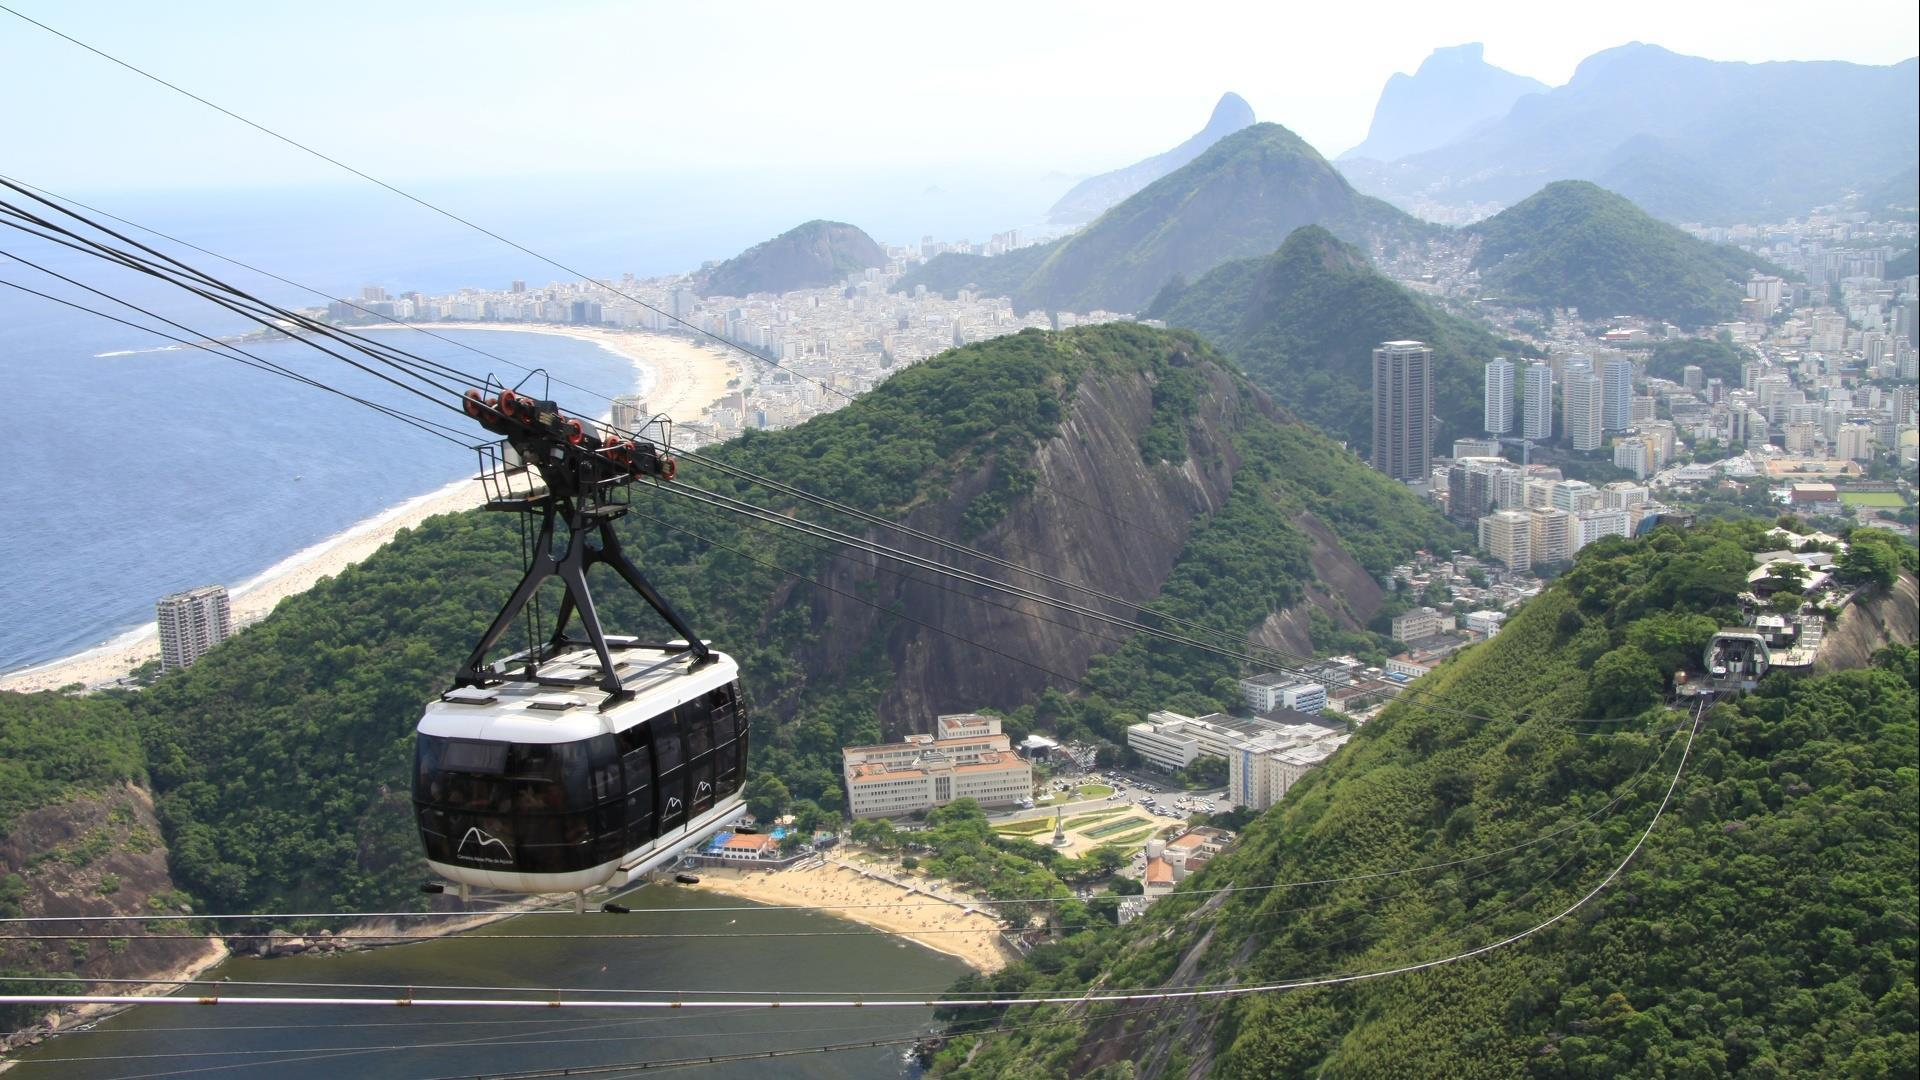 Brasilien | Rio de Janeiro, Foz do Iguacu, Amazonas, Imbassai: 13 Tage Rundreise in Kleingruppe - Highlights Brasiliens